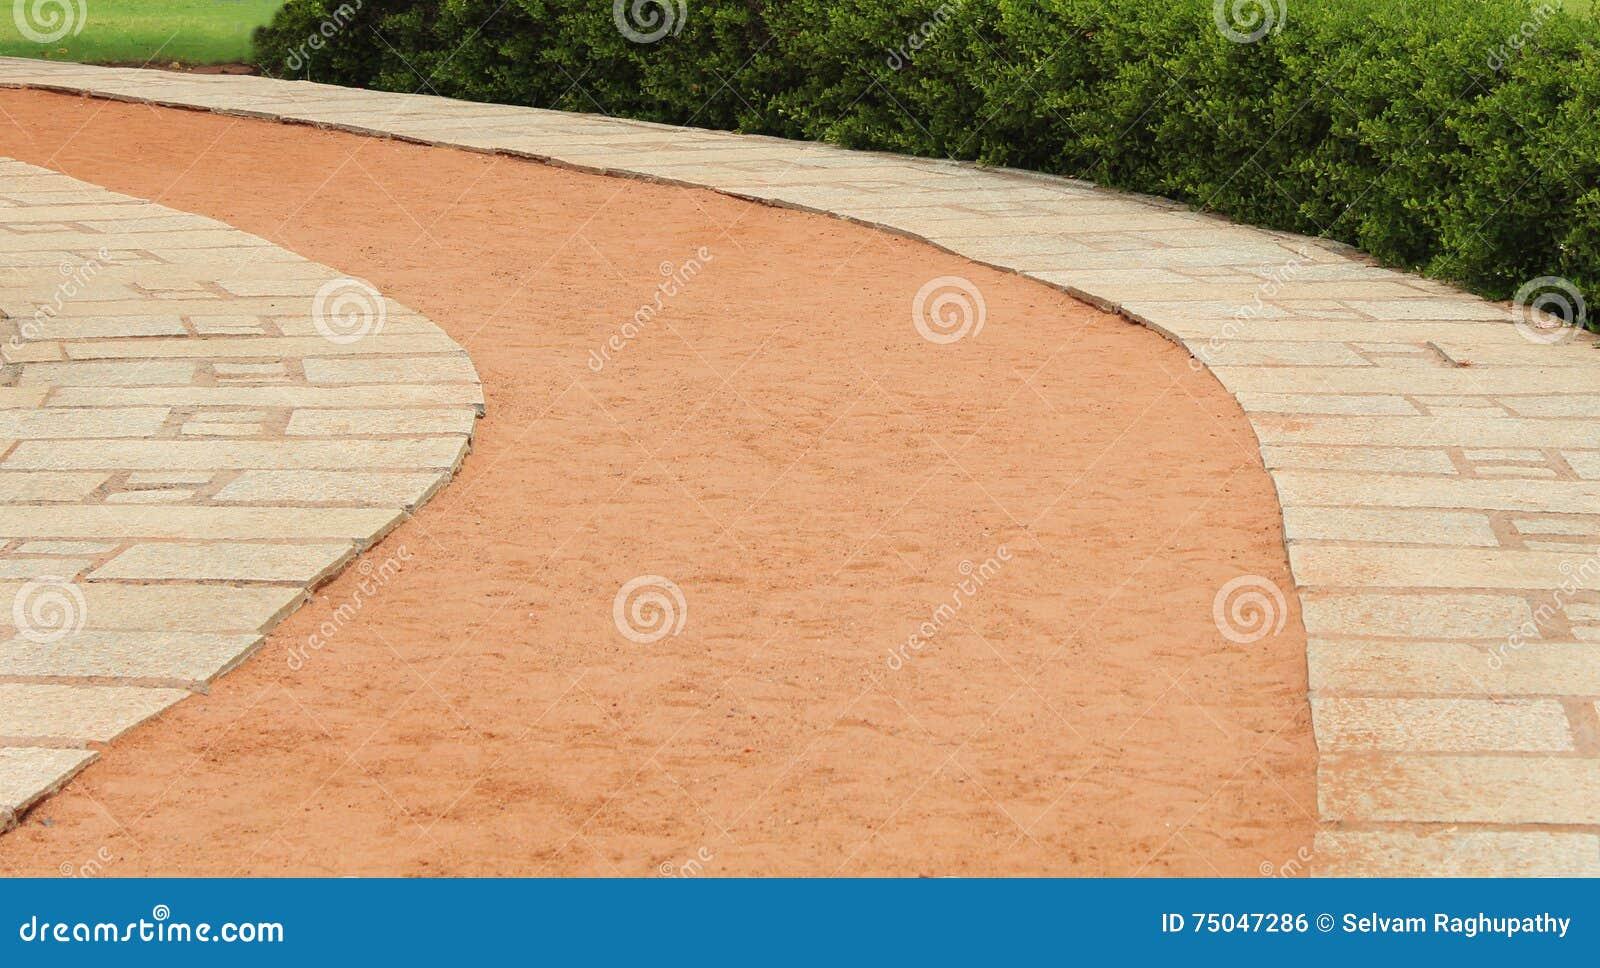 Beach curve path